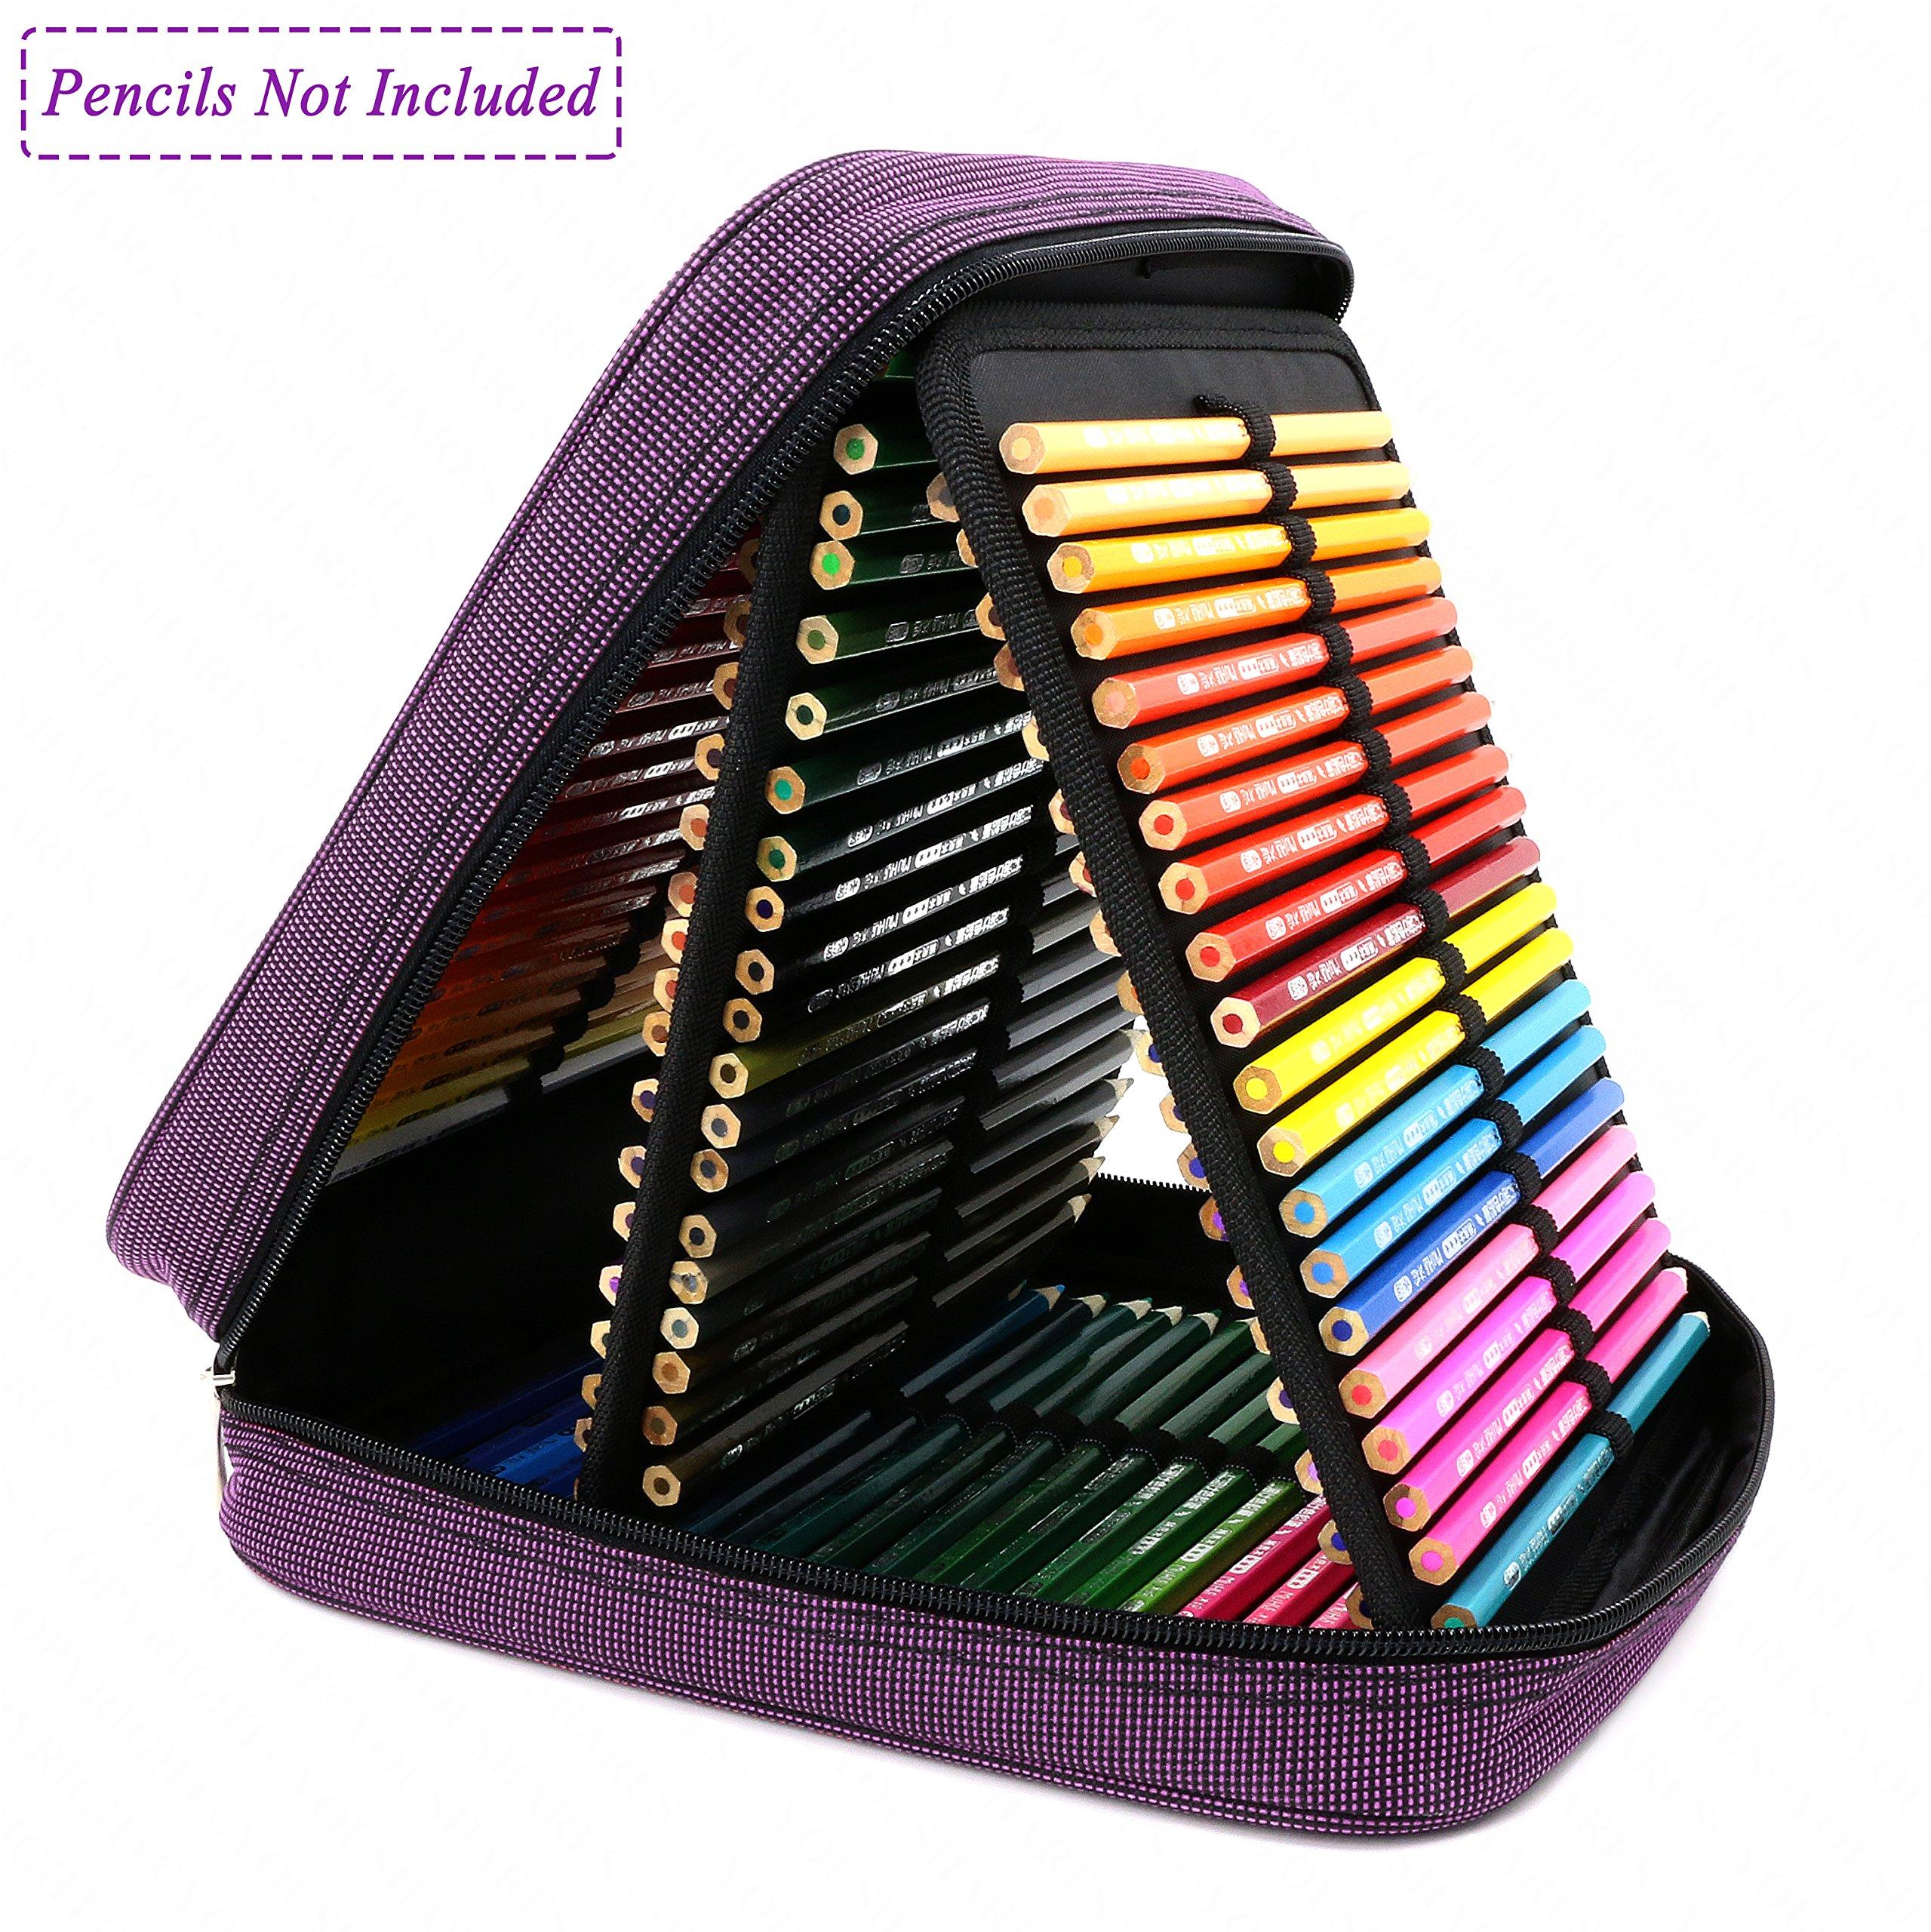 YOUSHARES® 120 Slots Pencil Case - Standable Dense Oxford Handy Multi-Layer Large Zipper Pen Bag for Prismacolor Watercolor Pencils, Crayola Colored Pencils, Marco Pens and Makeup Brush (Deep Purple)